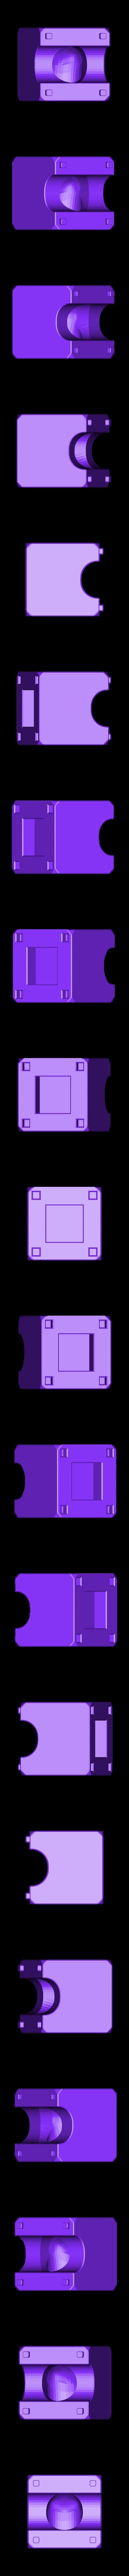 MarbleRunBlocks-StraightTunnelCorner.stl Download STL file Marble Run Blocks - Extension pack • 3D printing design, Wabby